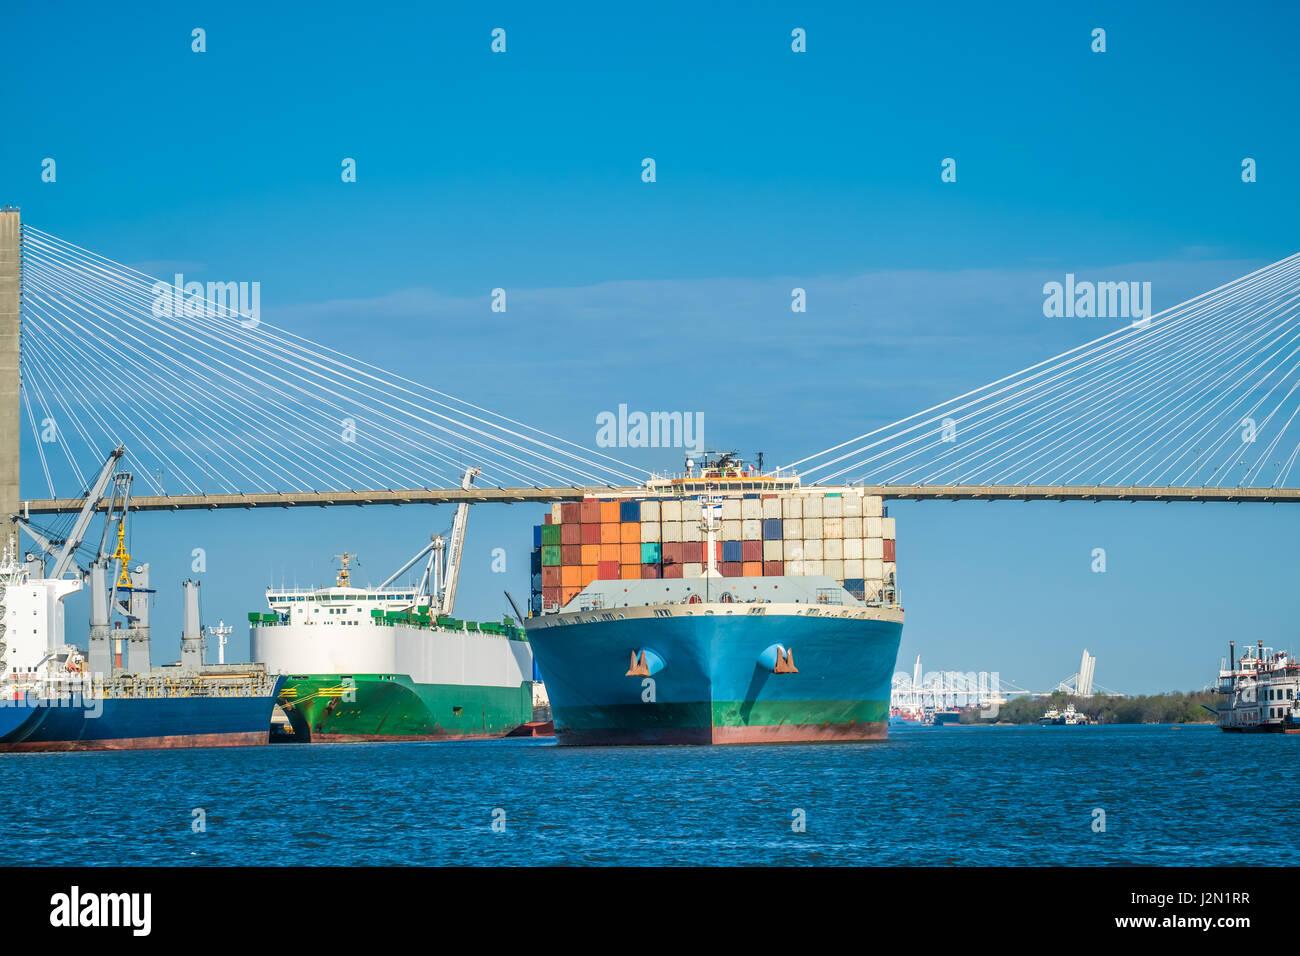 Huge container ships pass under the Talmadge Memorial Bridge over the Savannah River in Savannah, Georgia, USA - Stock Image